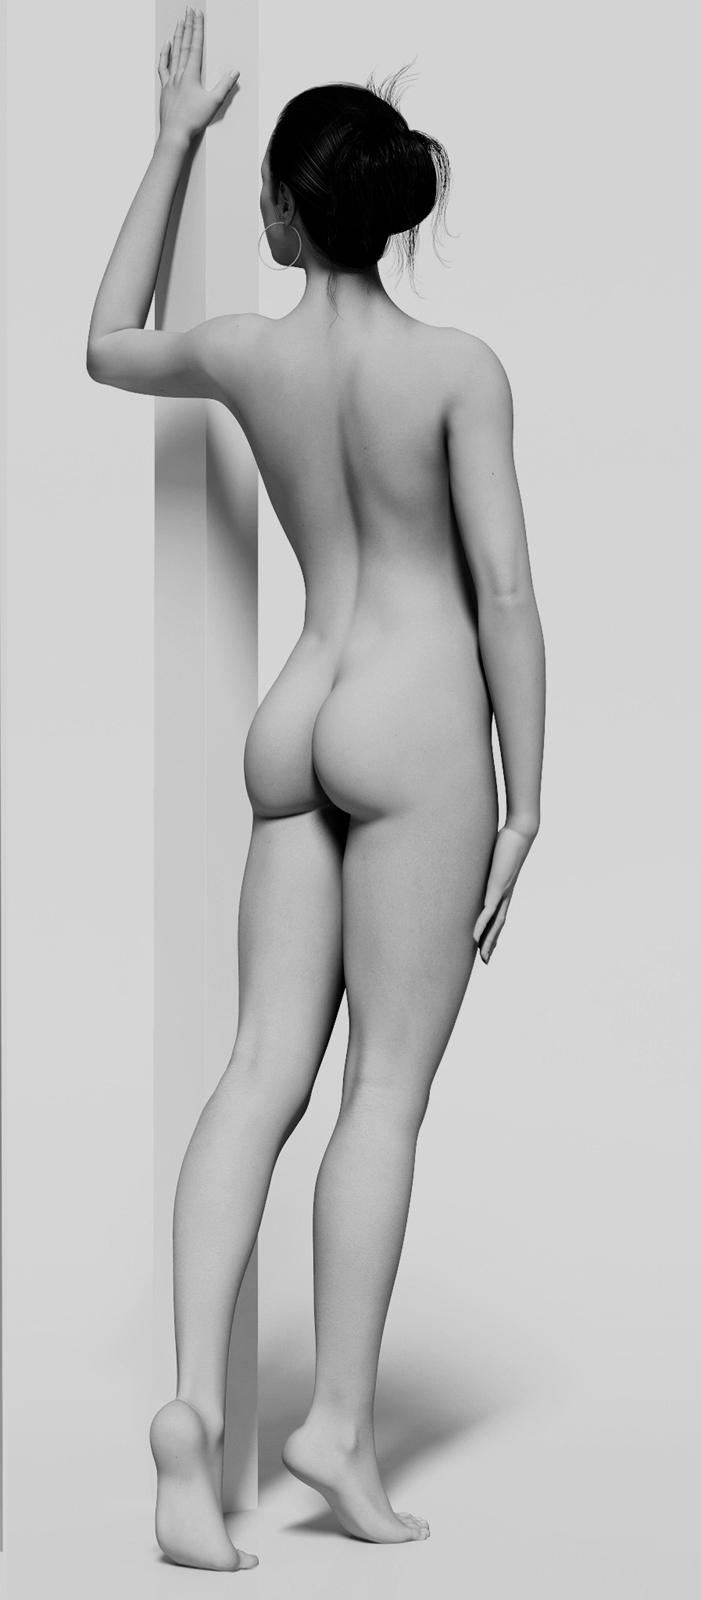 Lixiaodong female body 1 297d8dce n317